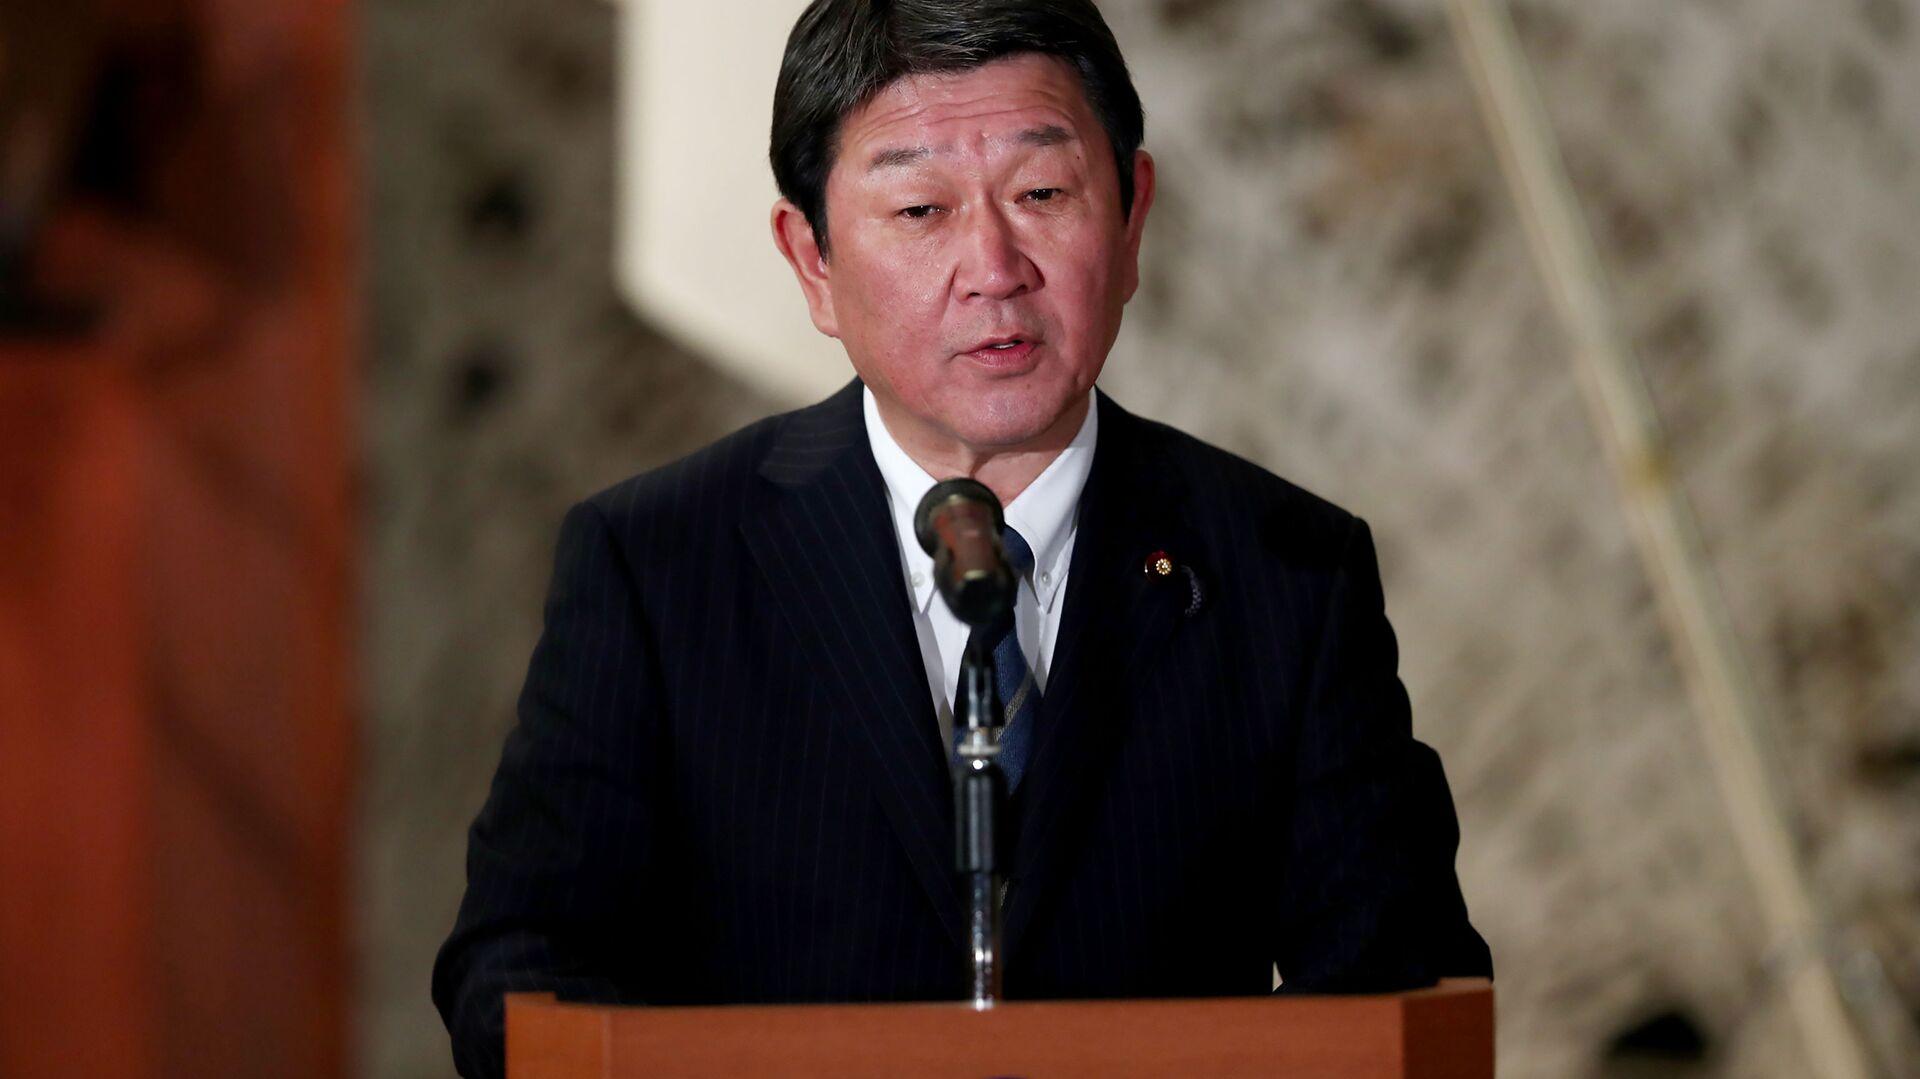 Il ministro degli Esteri giapponese Toshimitsu Motegi - Sputnik Italia, 1920, 22.08.2021